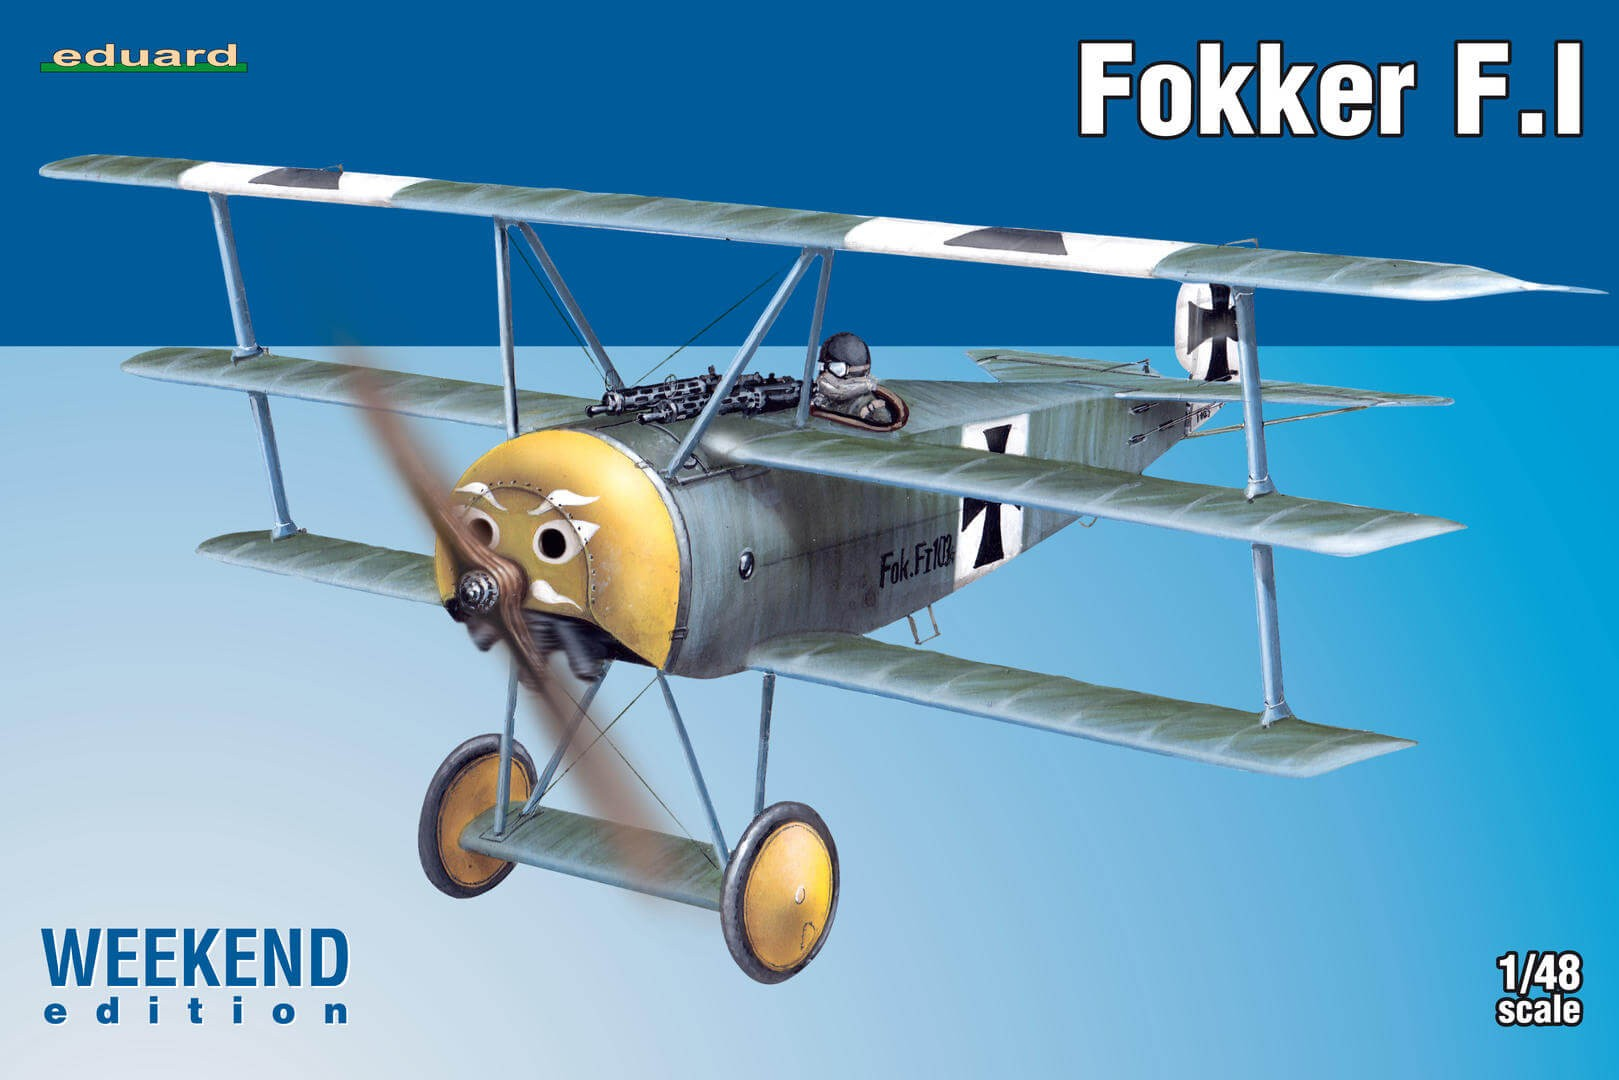 1:48 Fokker F.I Weekend Edition Plastic Model Kit